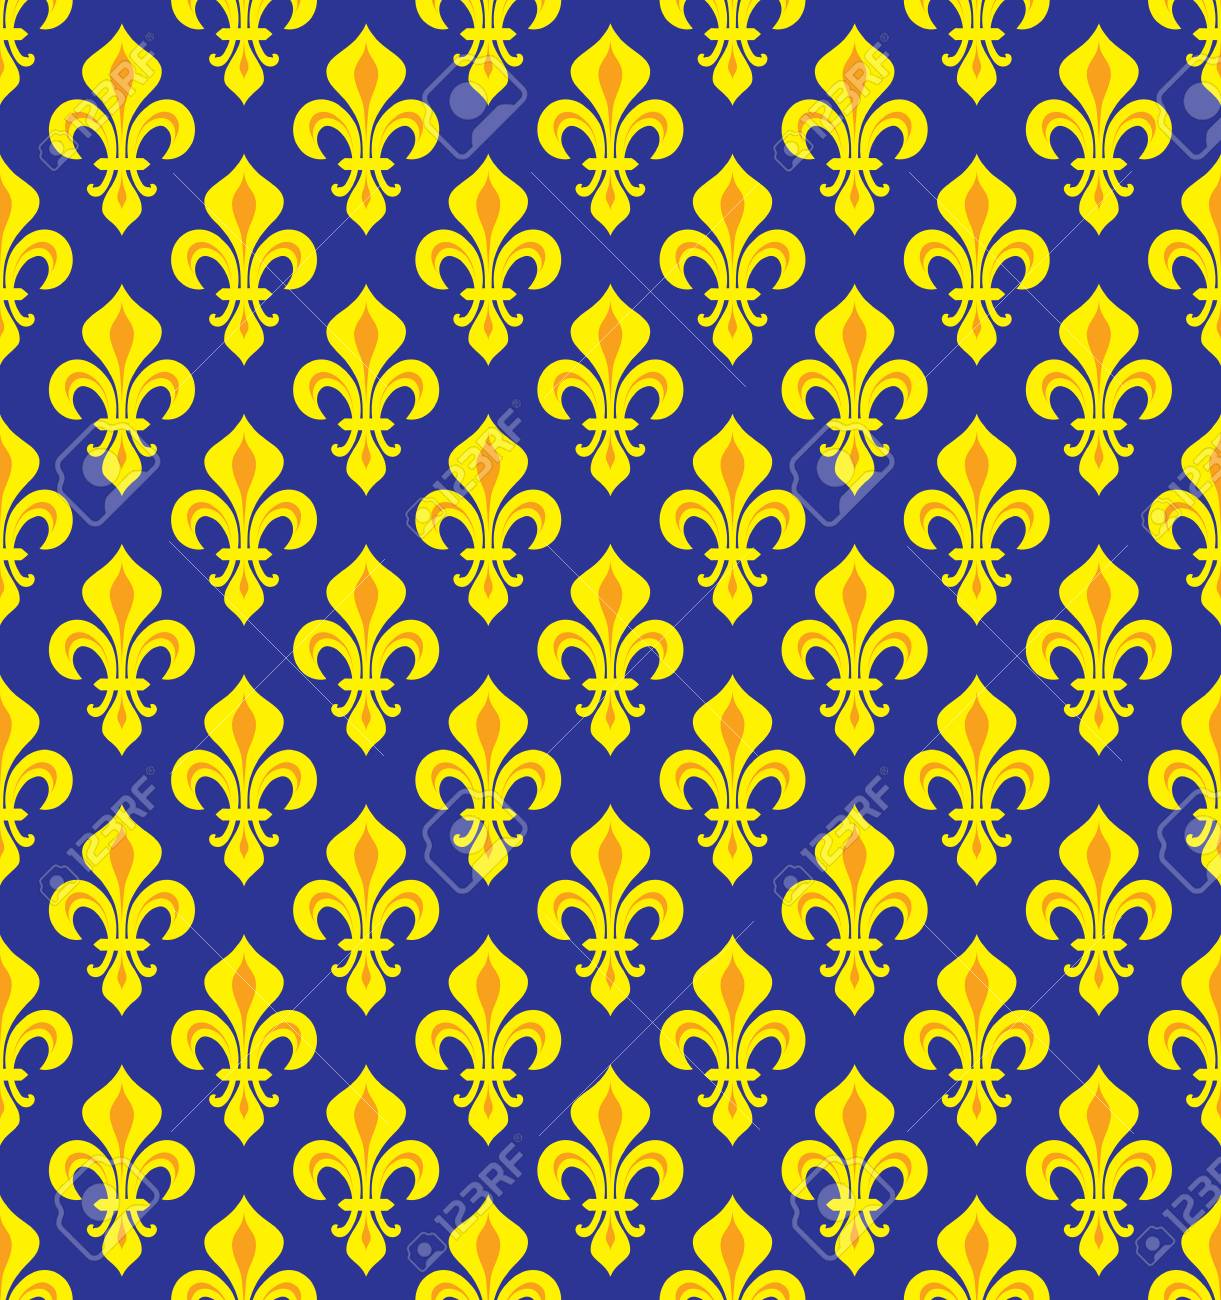 Royal Heraldic Lilies Fleur De Lis â Dark Blue Yellowviolet Velvet Seamless Pattern Wallpaper Background